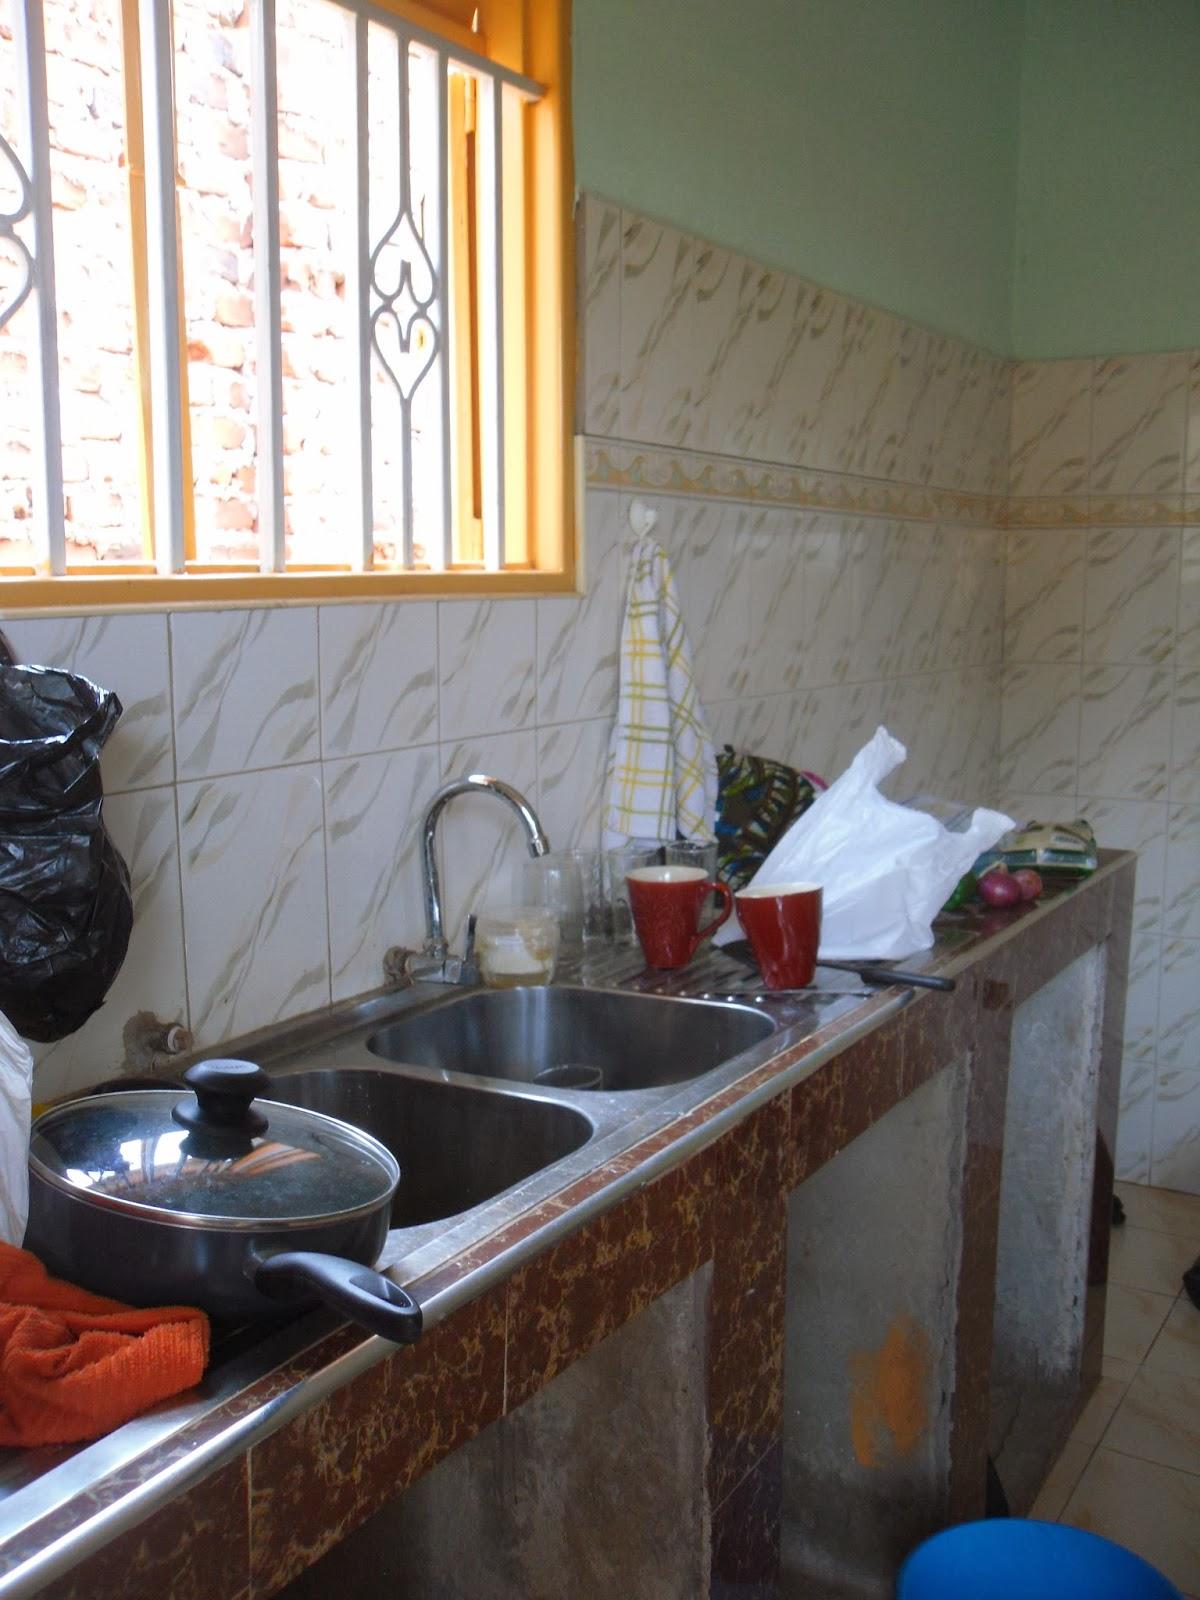 Isaac & Rachel in Uganda: Our Home